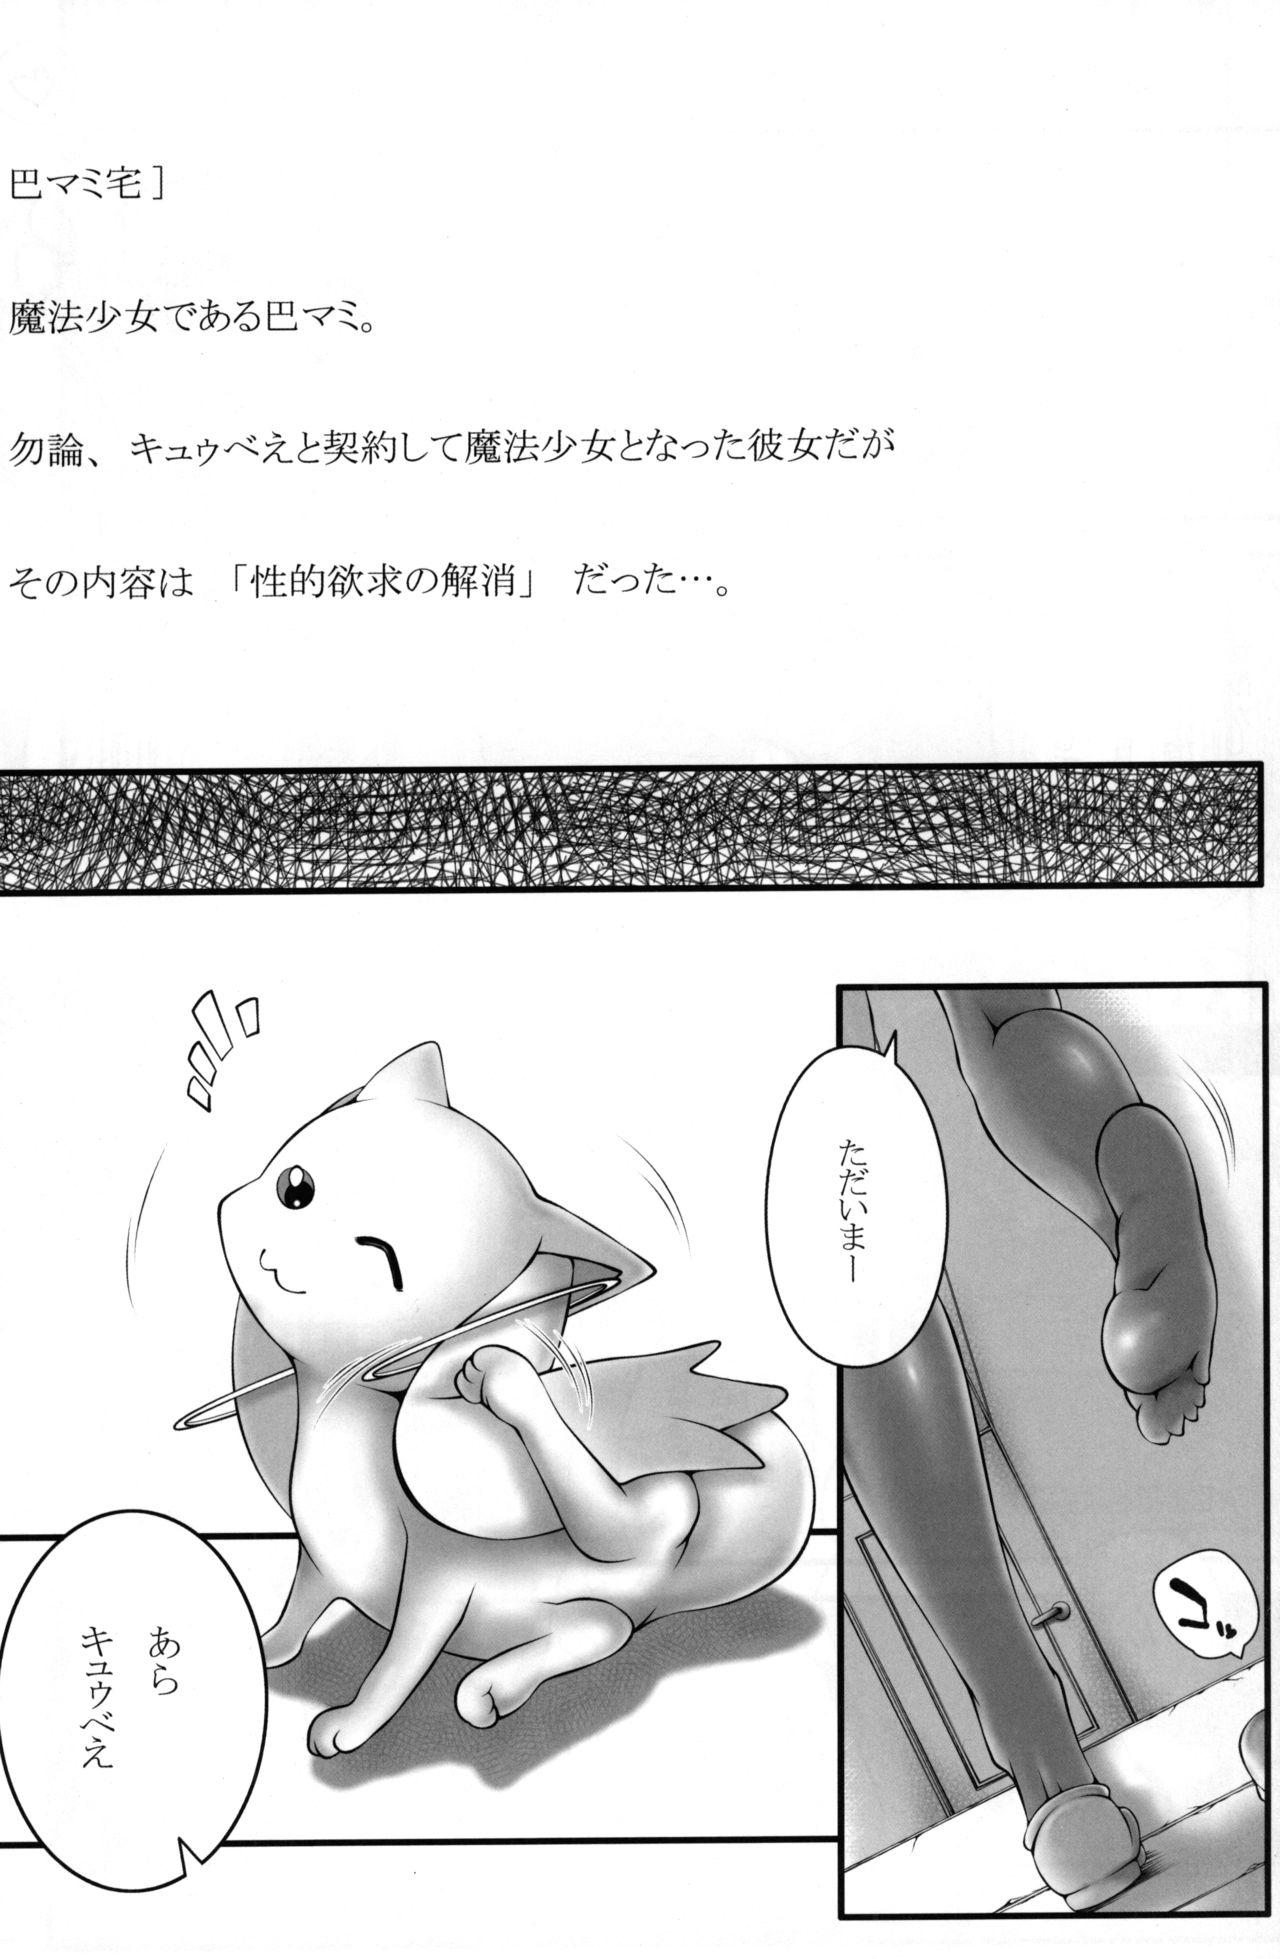 Mami-san to. 1